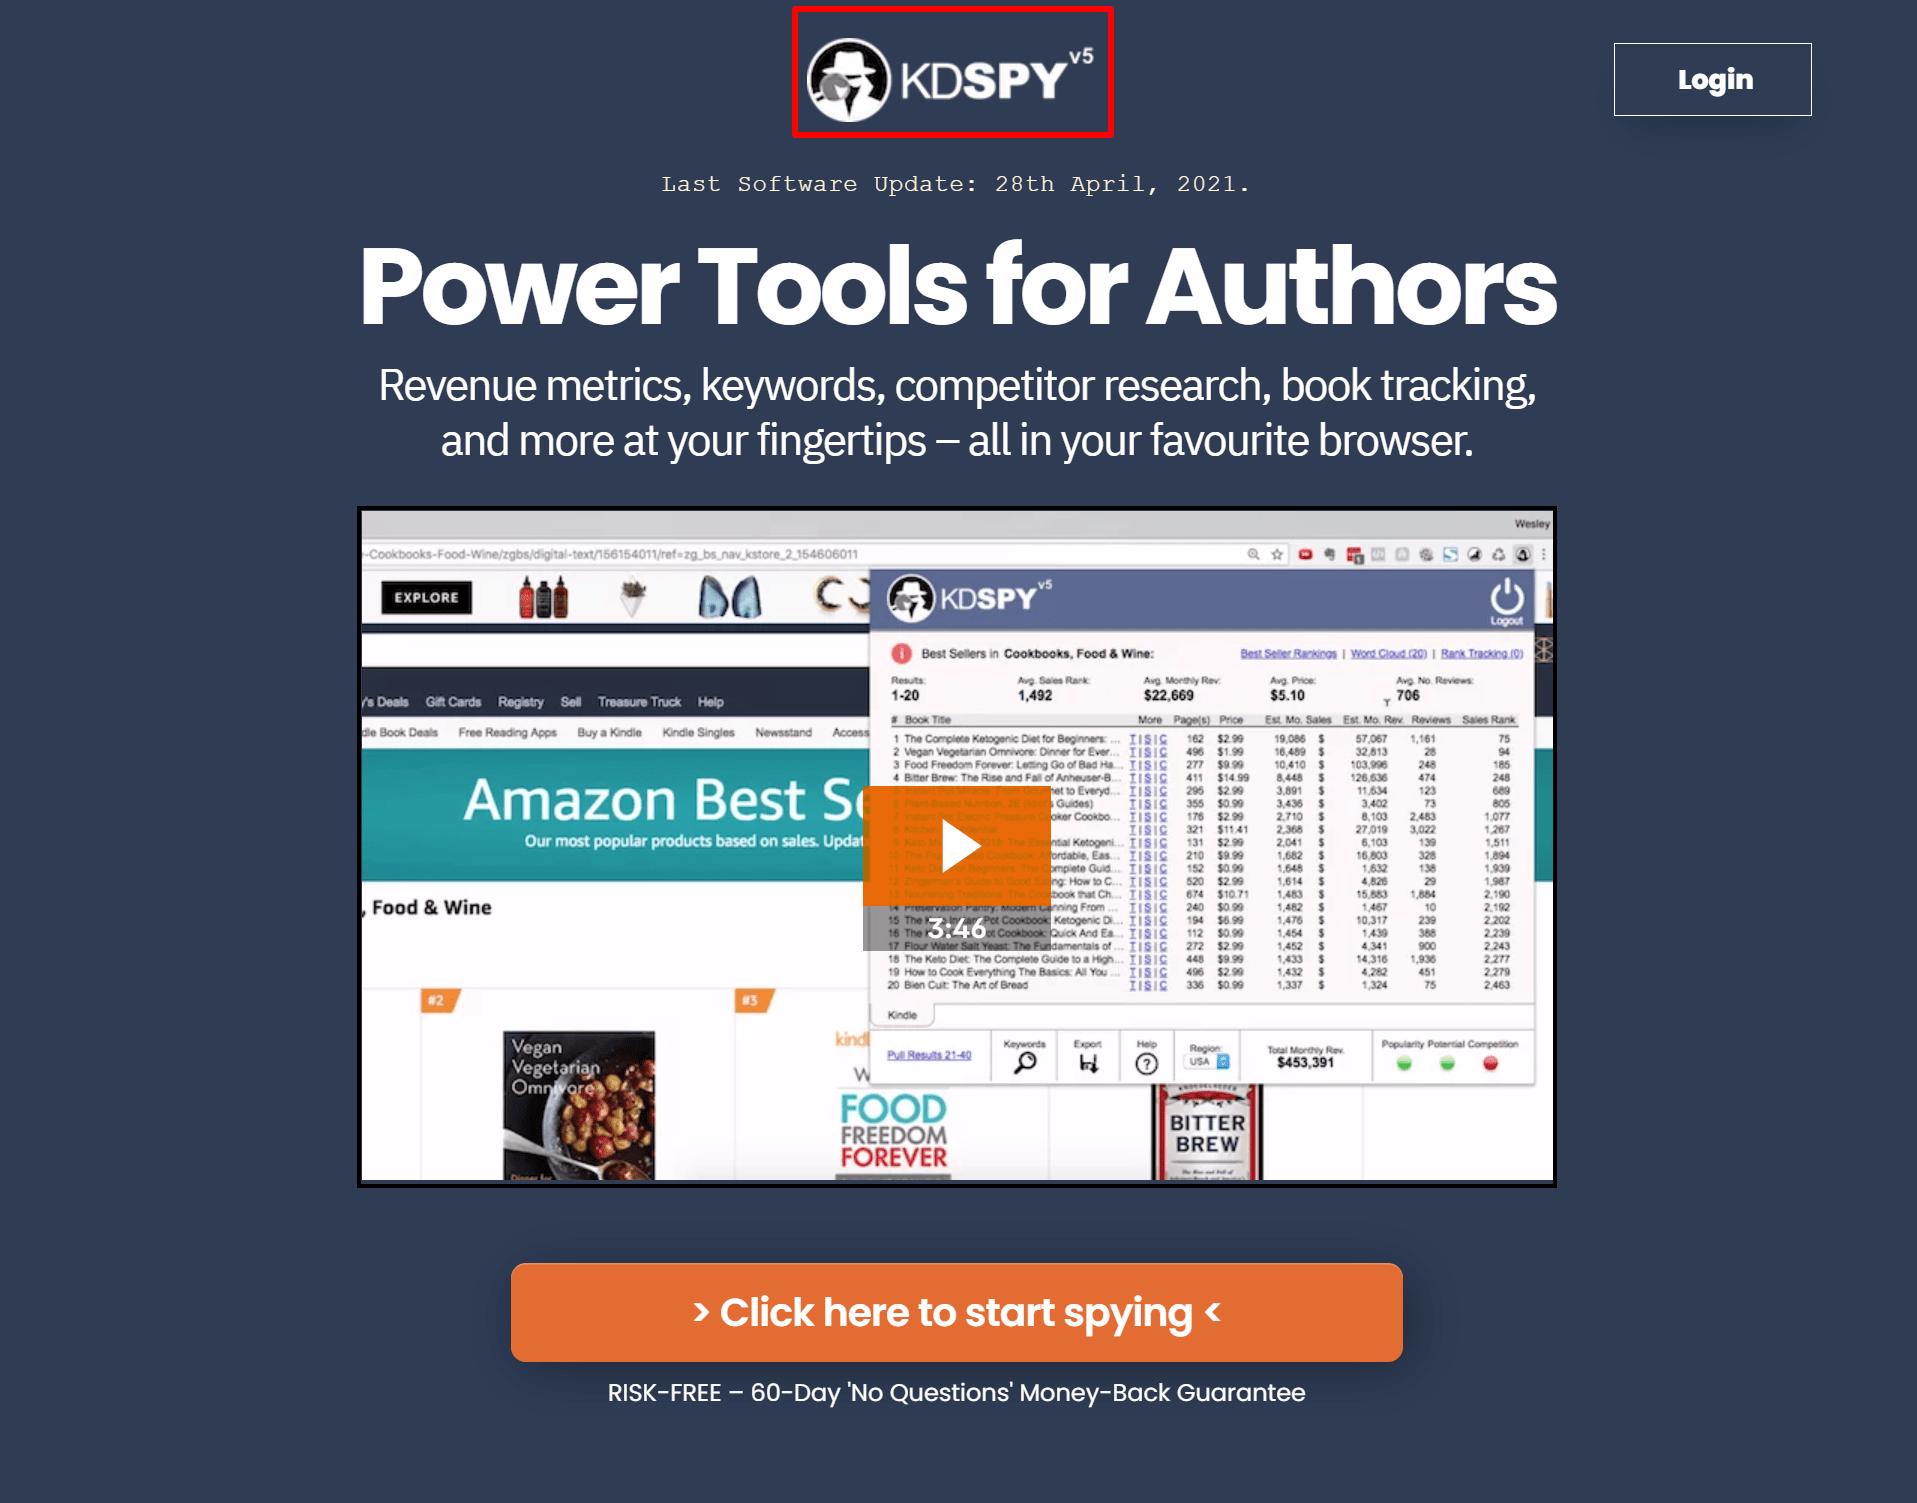 KDSPY-Kindle-Keyword-s-Niche-s-Genre-s-Research-Tool